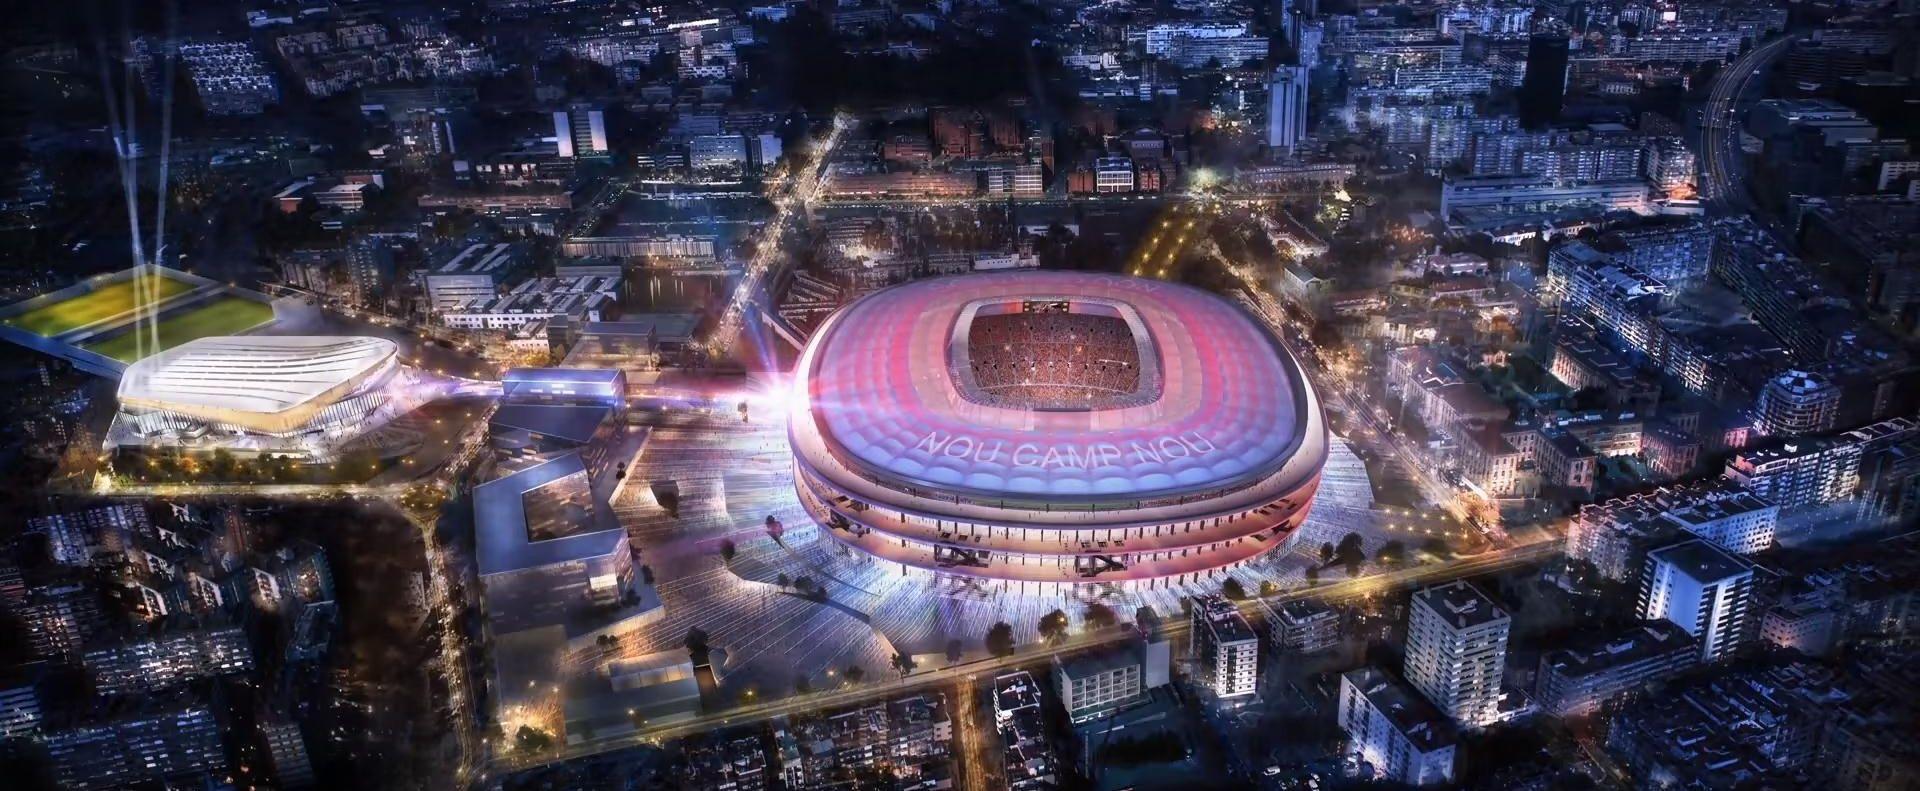 VIDEO: BUDUĆNOST STADIONA? Predstavljen plan za novi Nou Camp